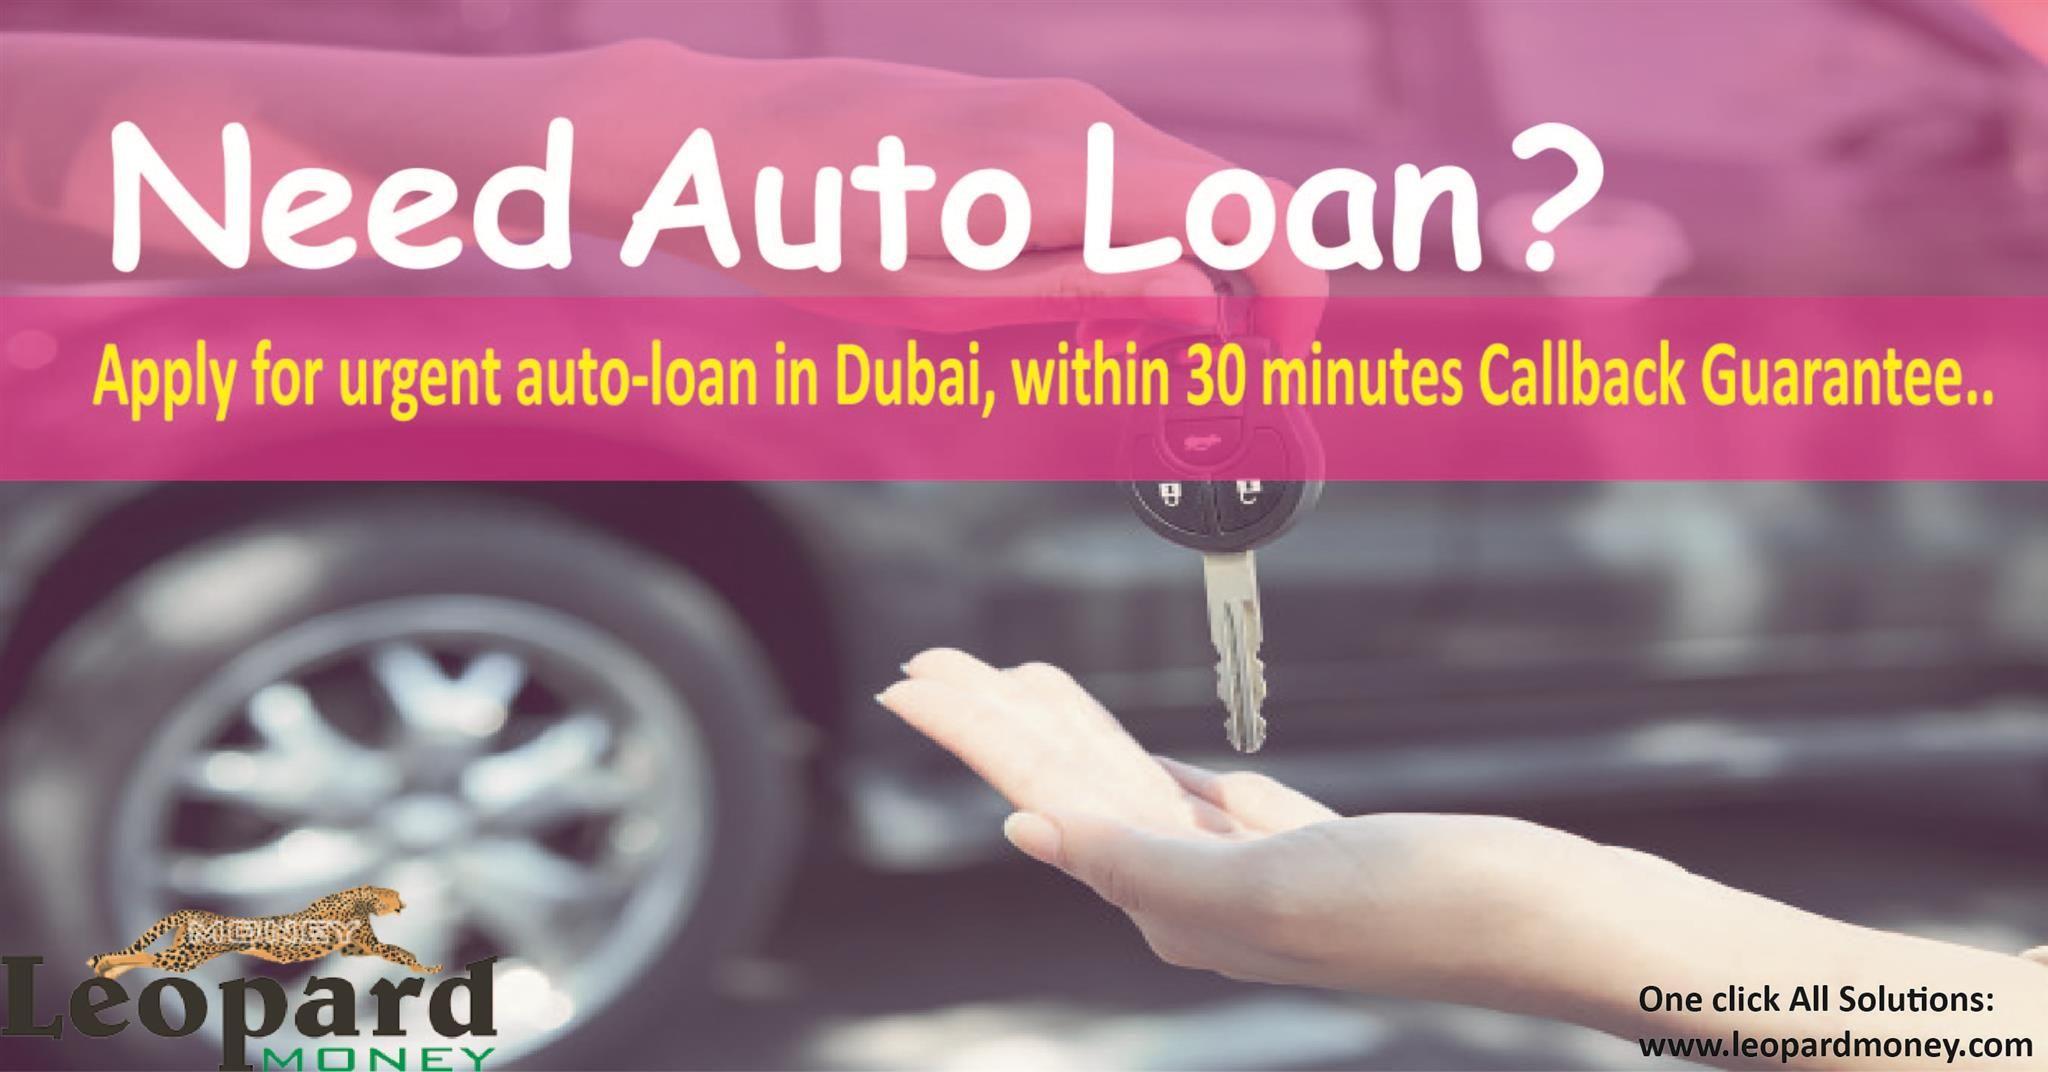 Mashreq Bank UAE Payday loans, Personal finance, Loans